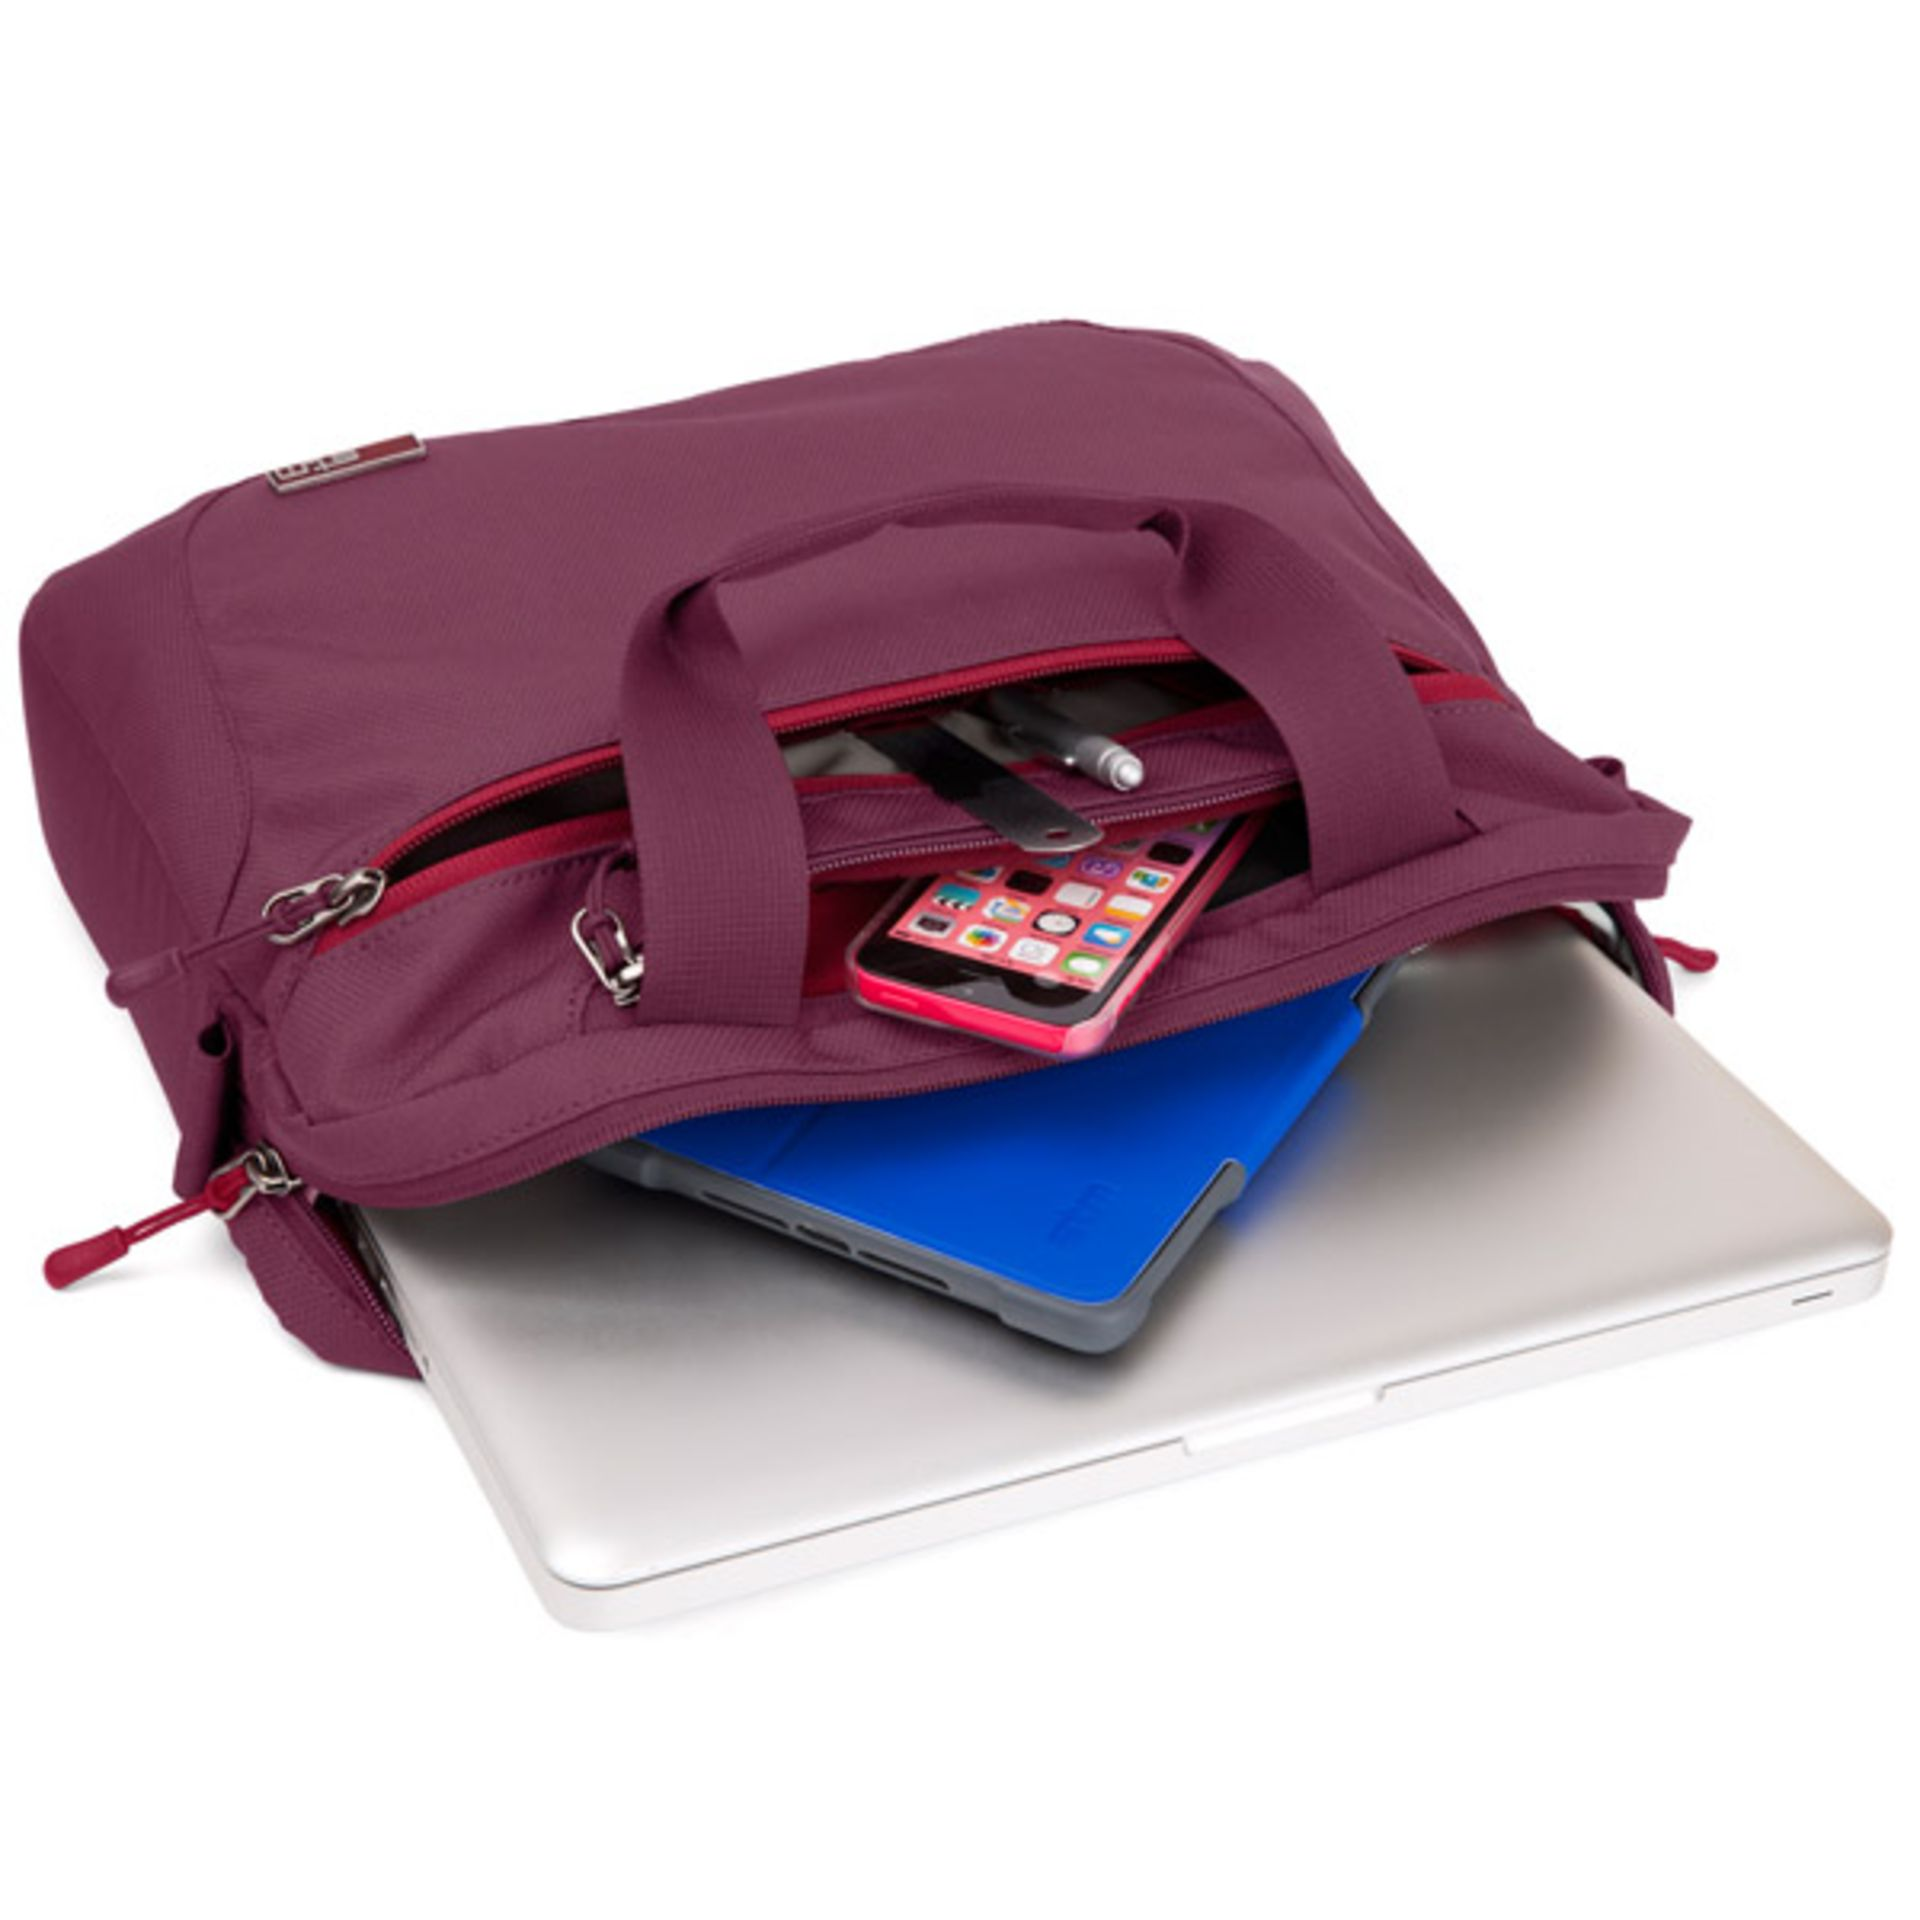 + VAT Brand New Medium Shoulder Bag - RRP £42.99 Amazon Price £33.57 - For Laptop/Tablet Up To